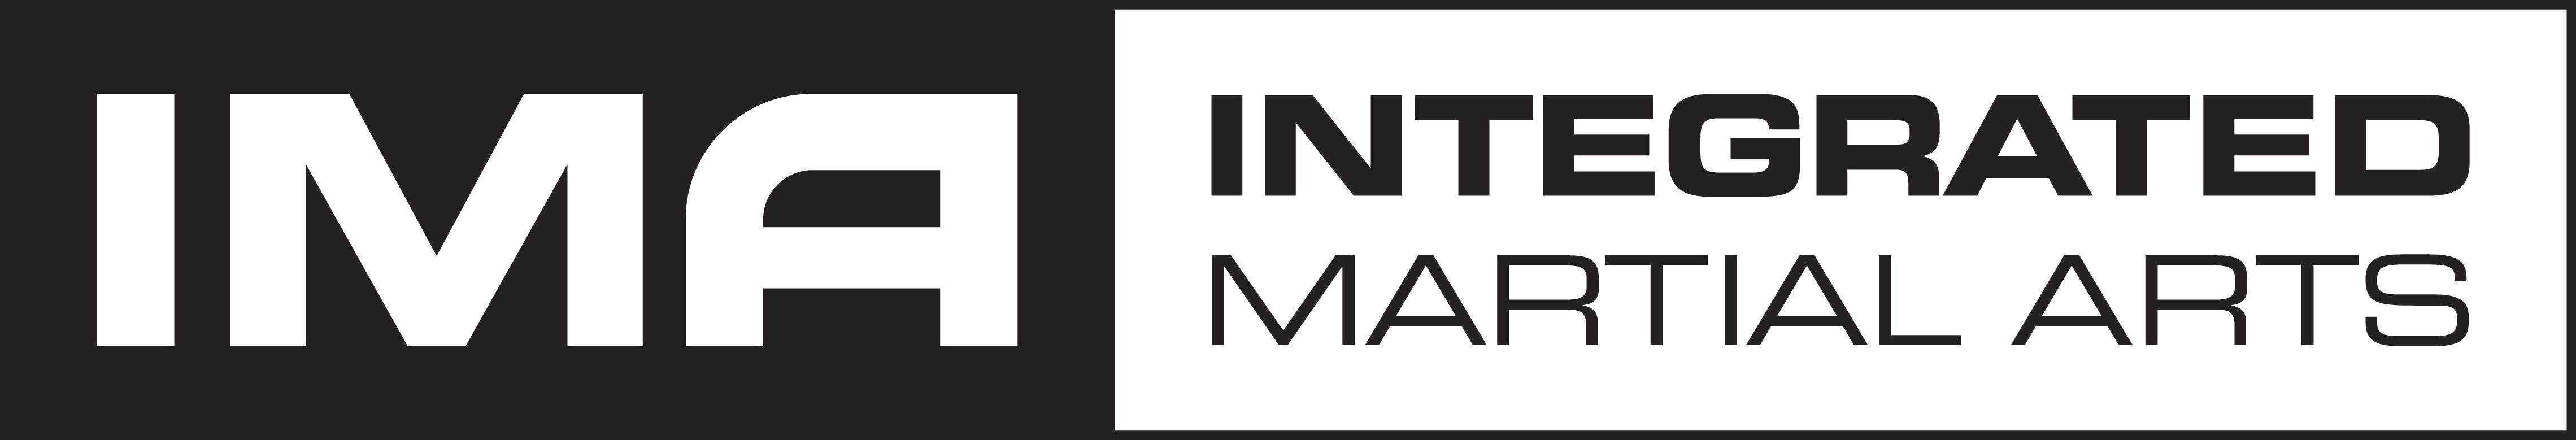 Integrated Martial Arts logo